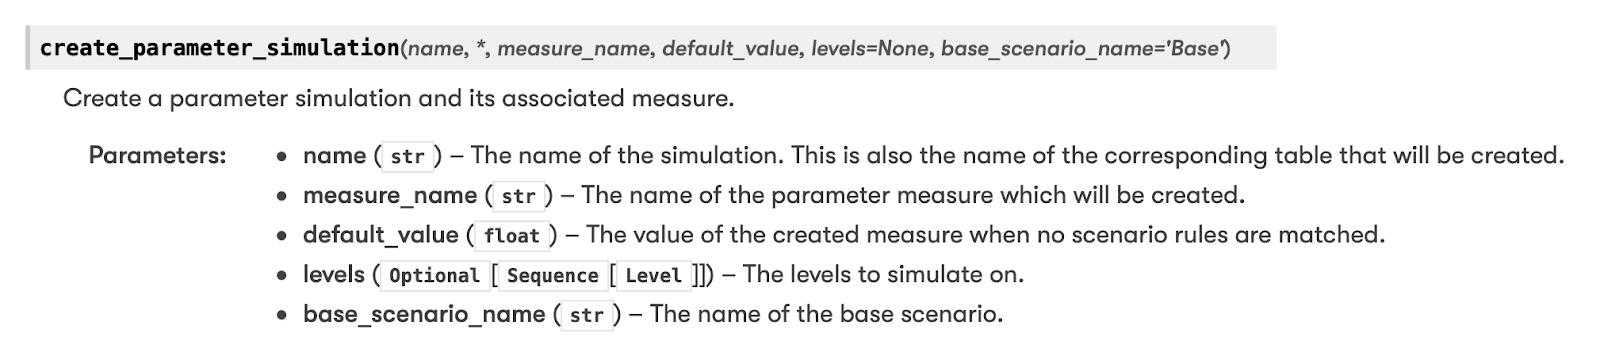 Parameter Simulation argument documentation